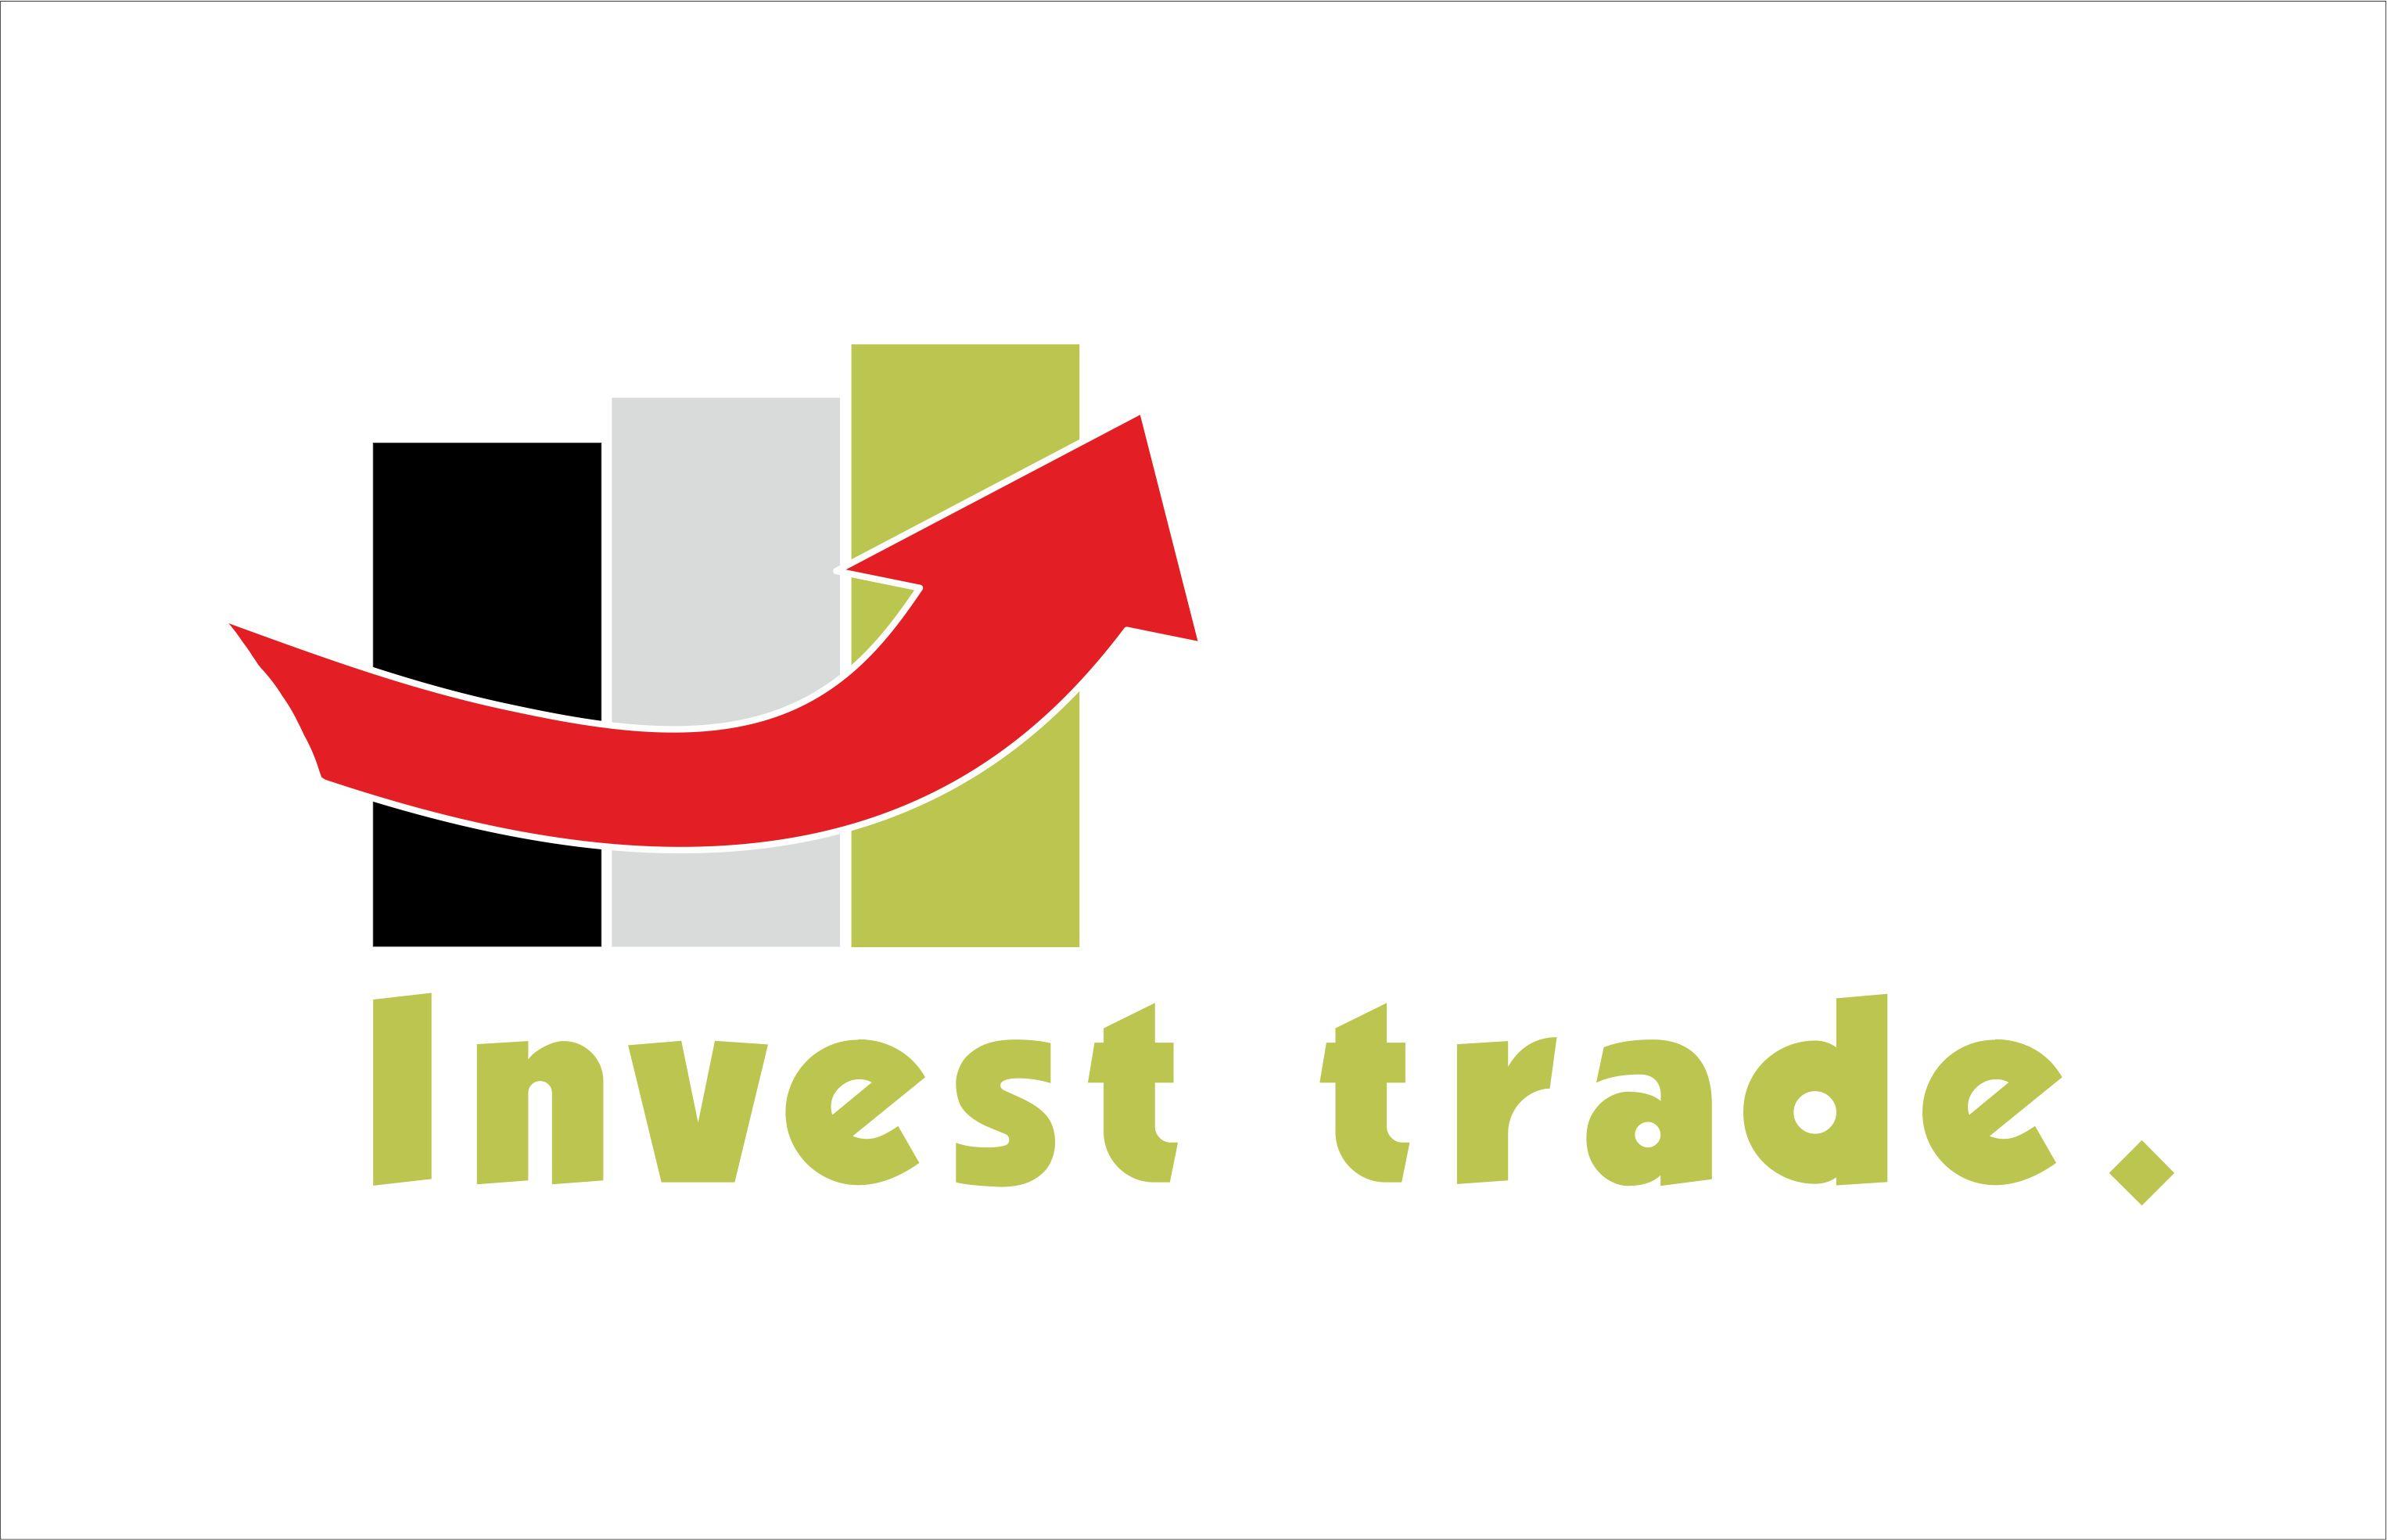 Разработка логотипа для компании Invest trade фото f_628512996b1c234d.jpg